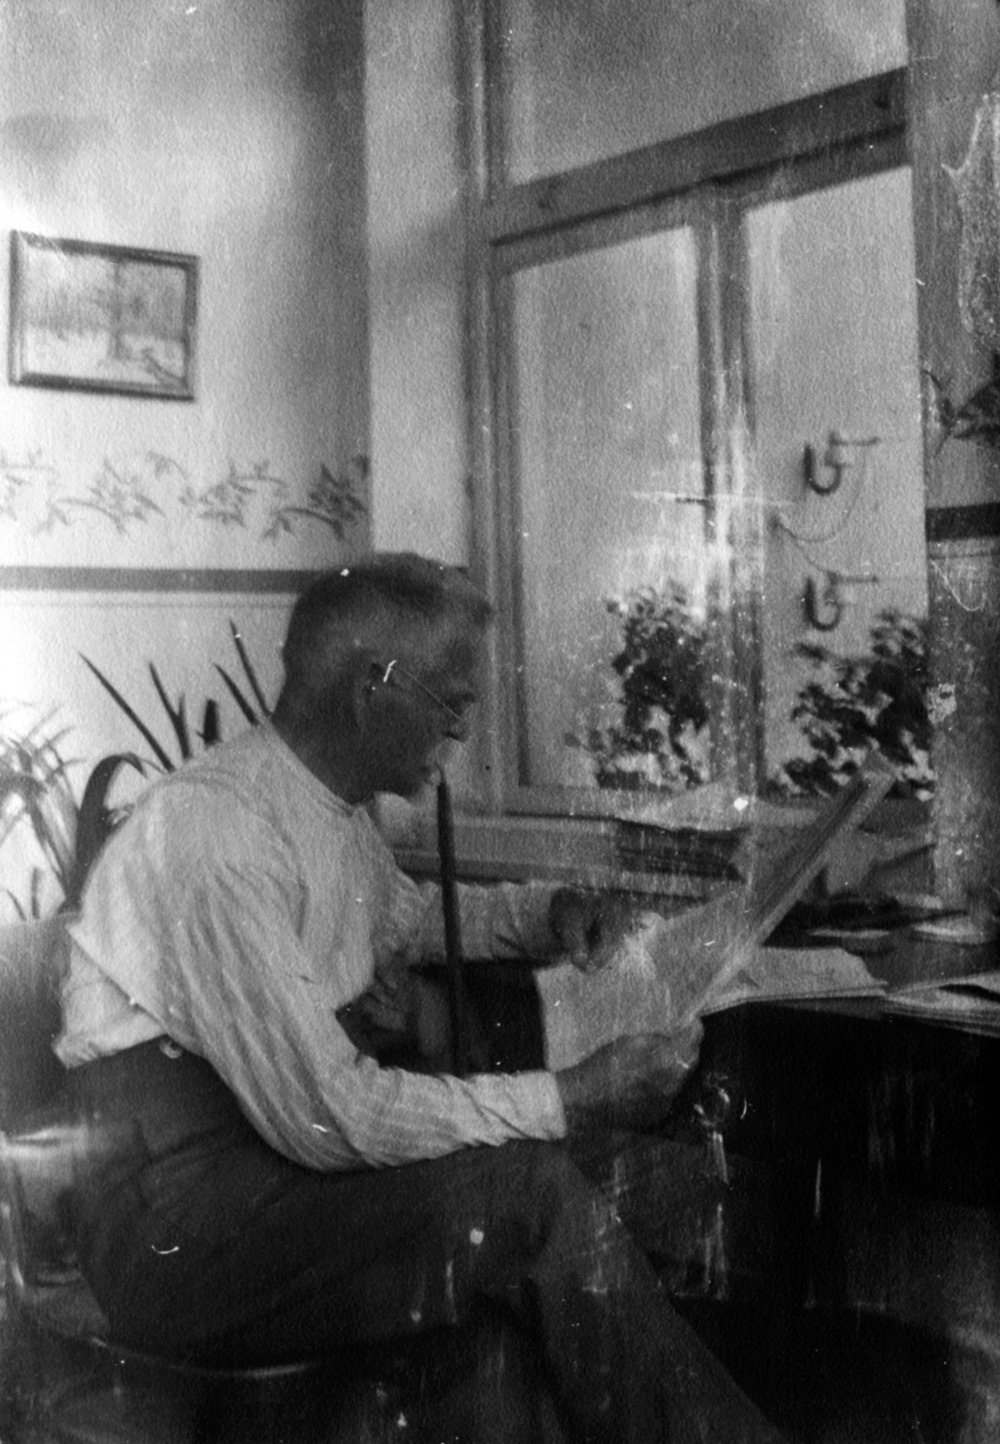 Jan Rous na fotografii z roku 1937